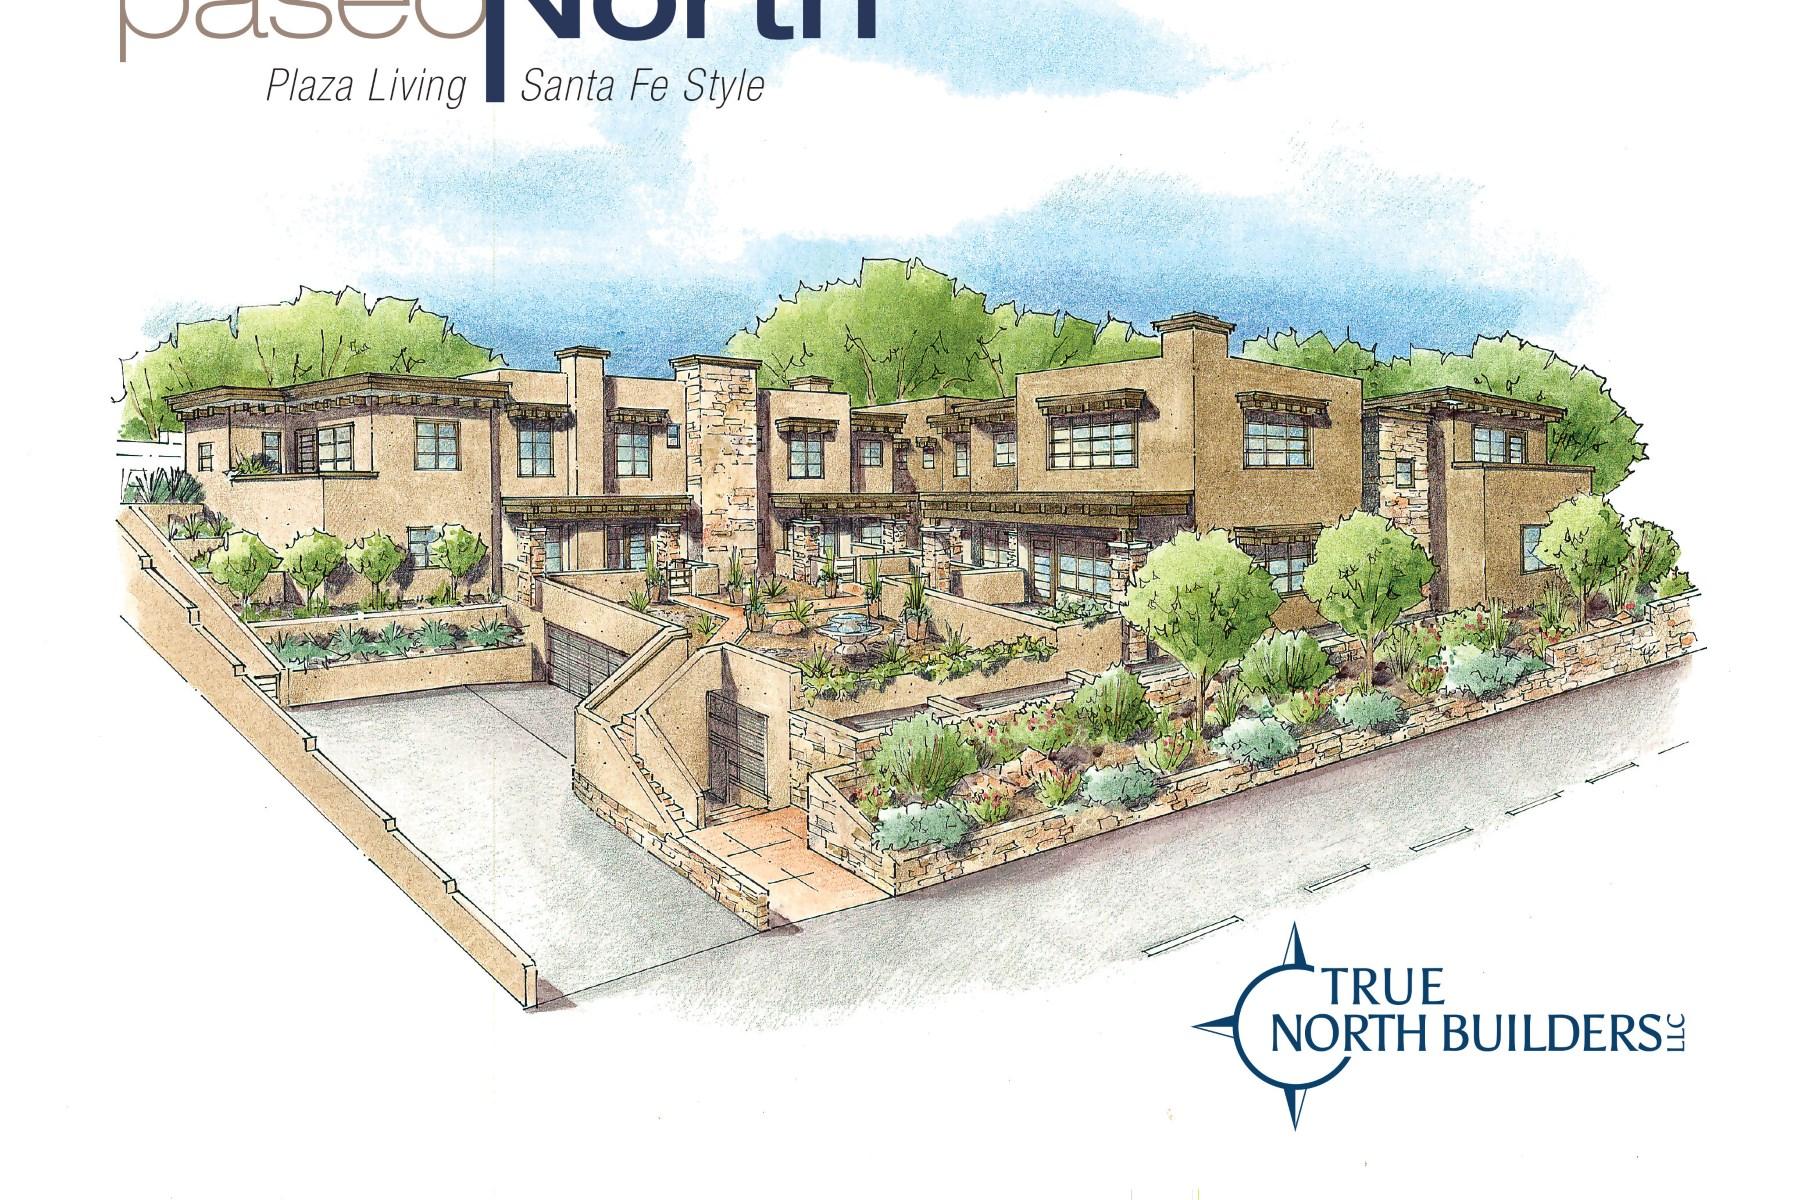 Condominium for Sale at 511 Paseo De Peralta #3 Santa Fe City Northeast, Santa Fe, New Mexico 87501 United States